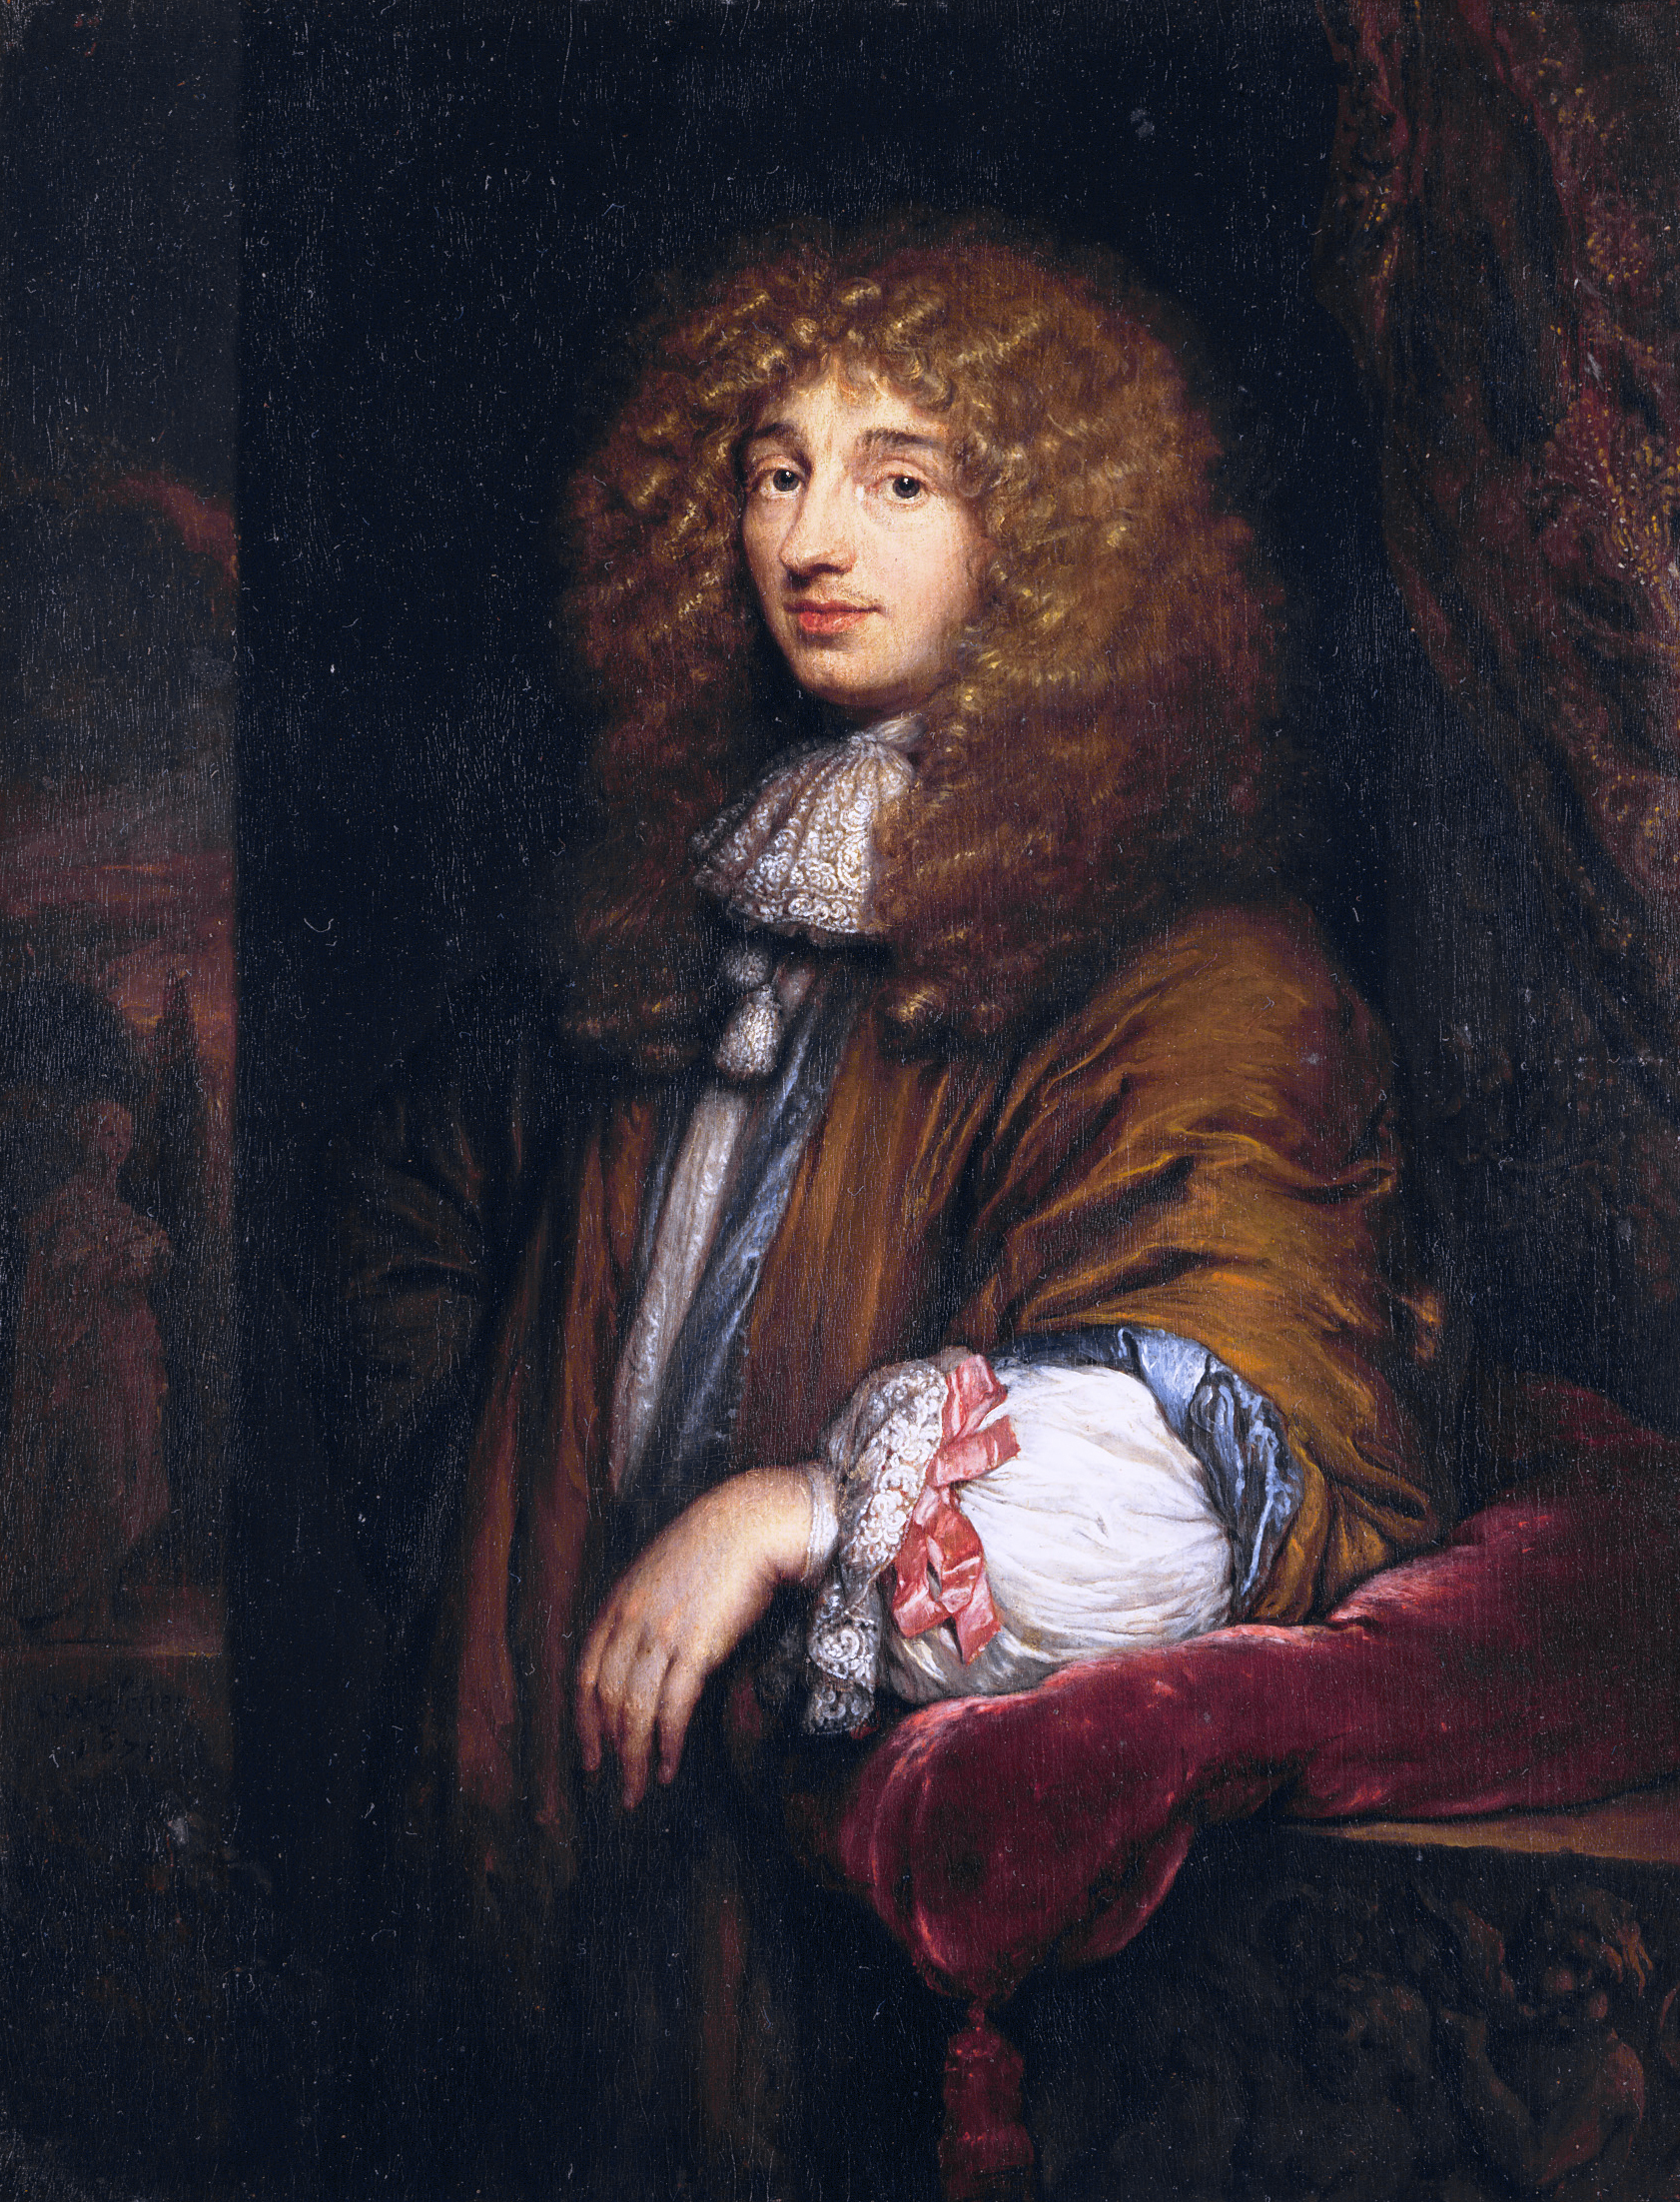 Archivo:Christiaan Huygens-painting.jpeg